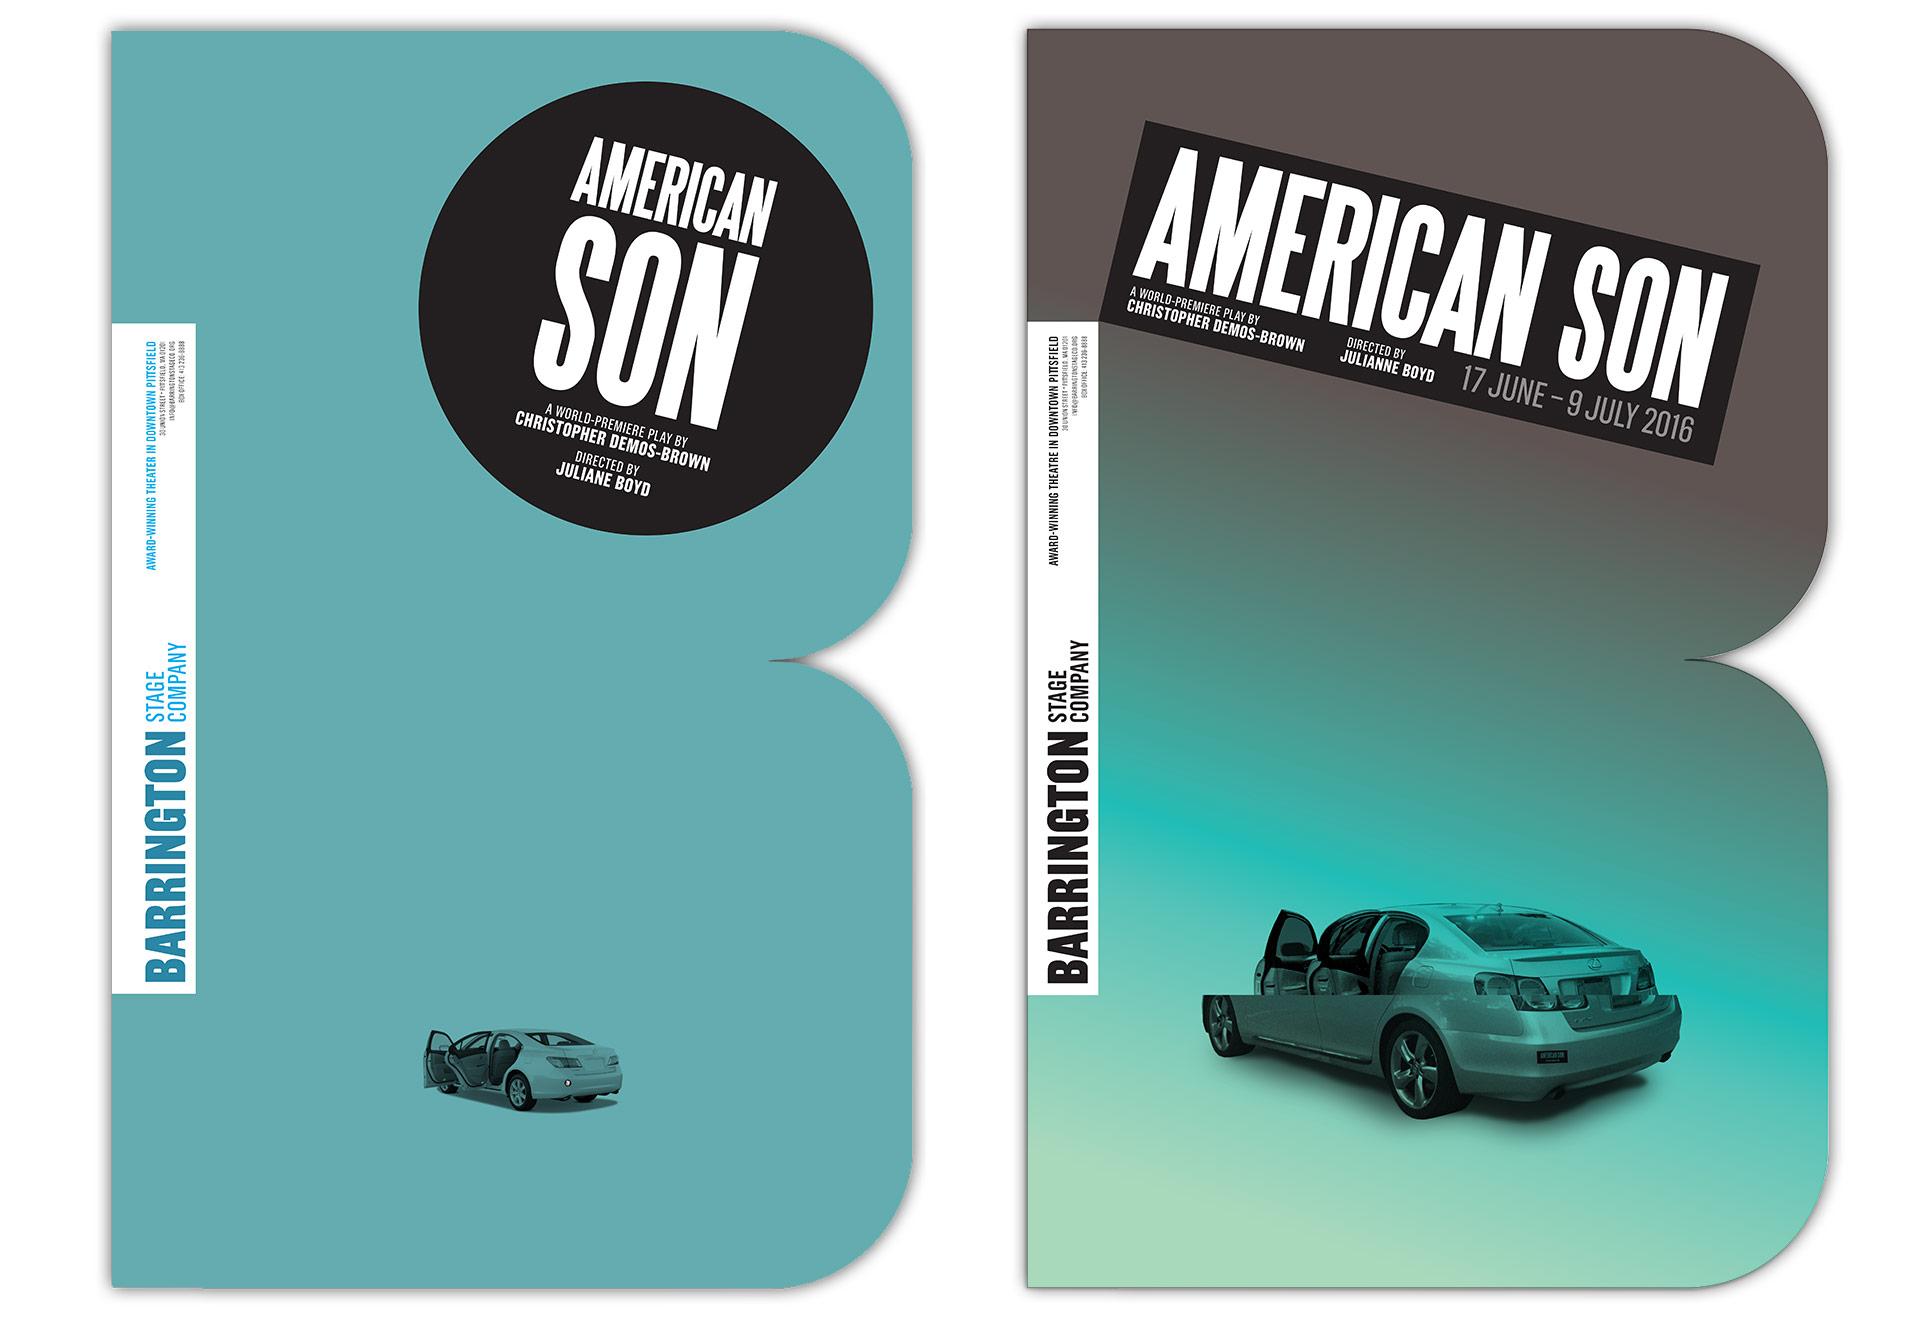 Barrington-comps-american-son-01.jpg